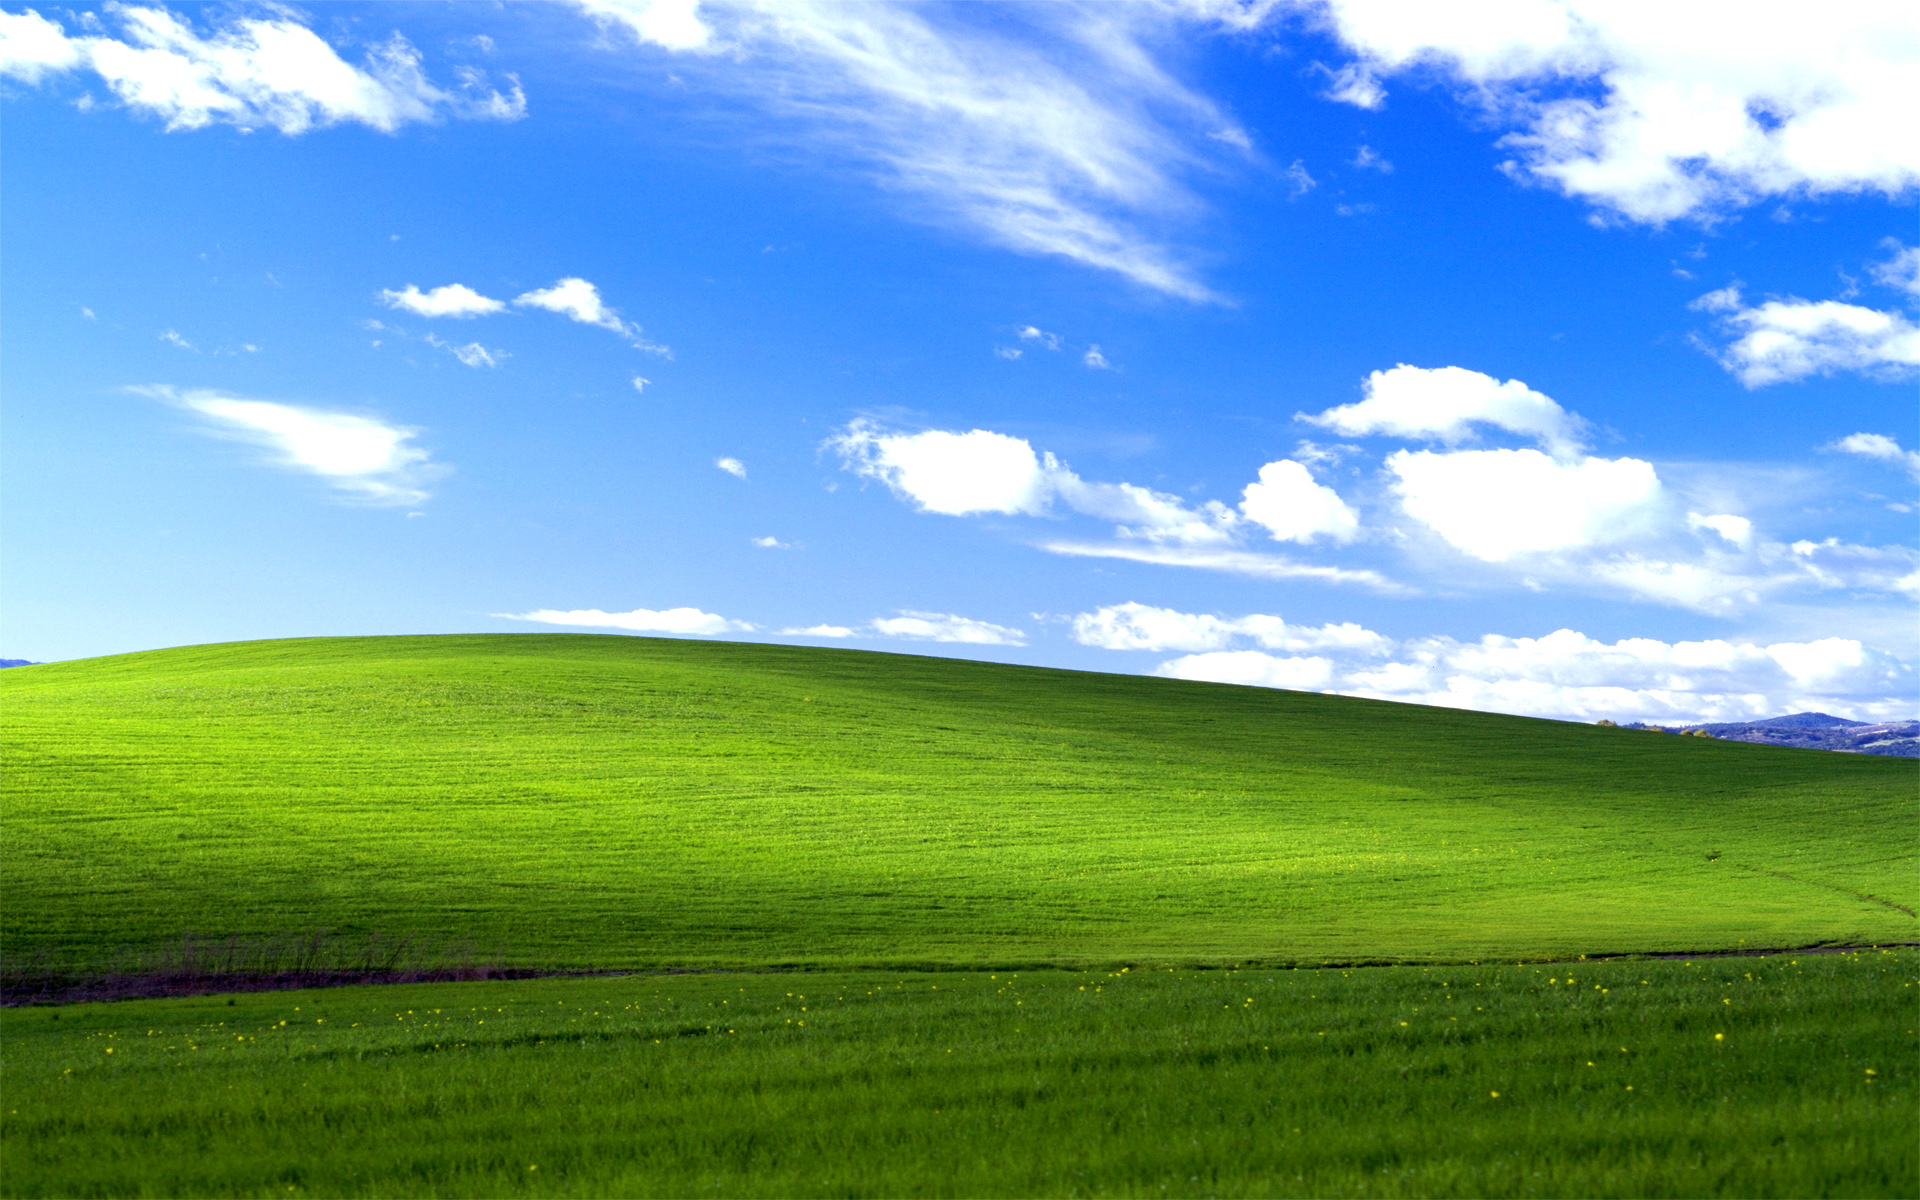 HD Windows XP Bliss Wallpaper Backgroundsjpg 1920x1200